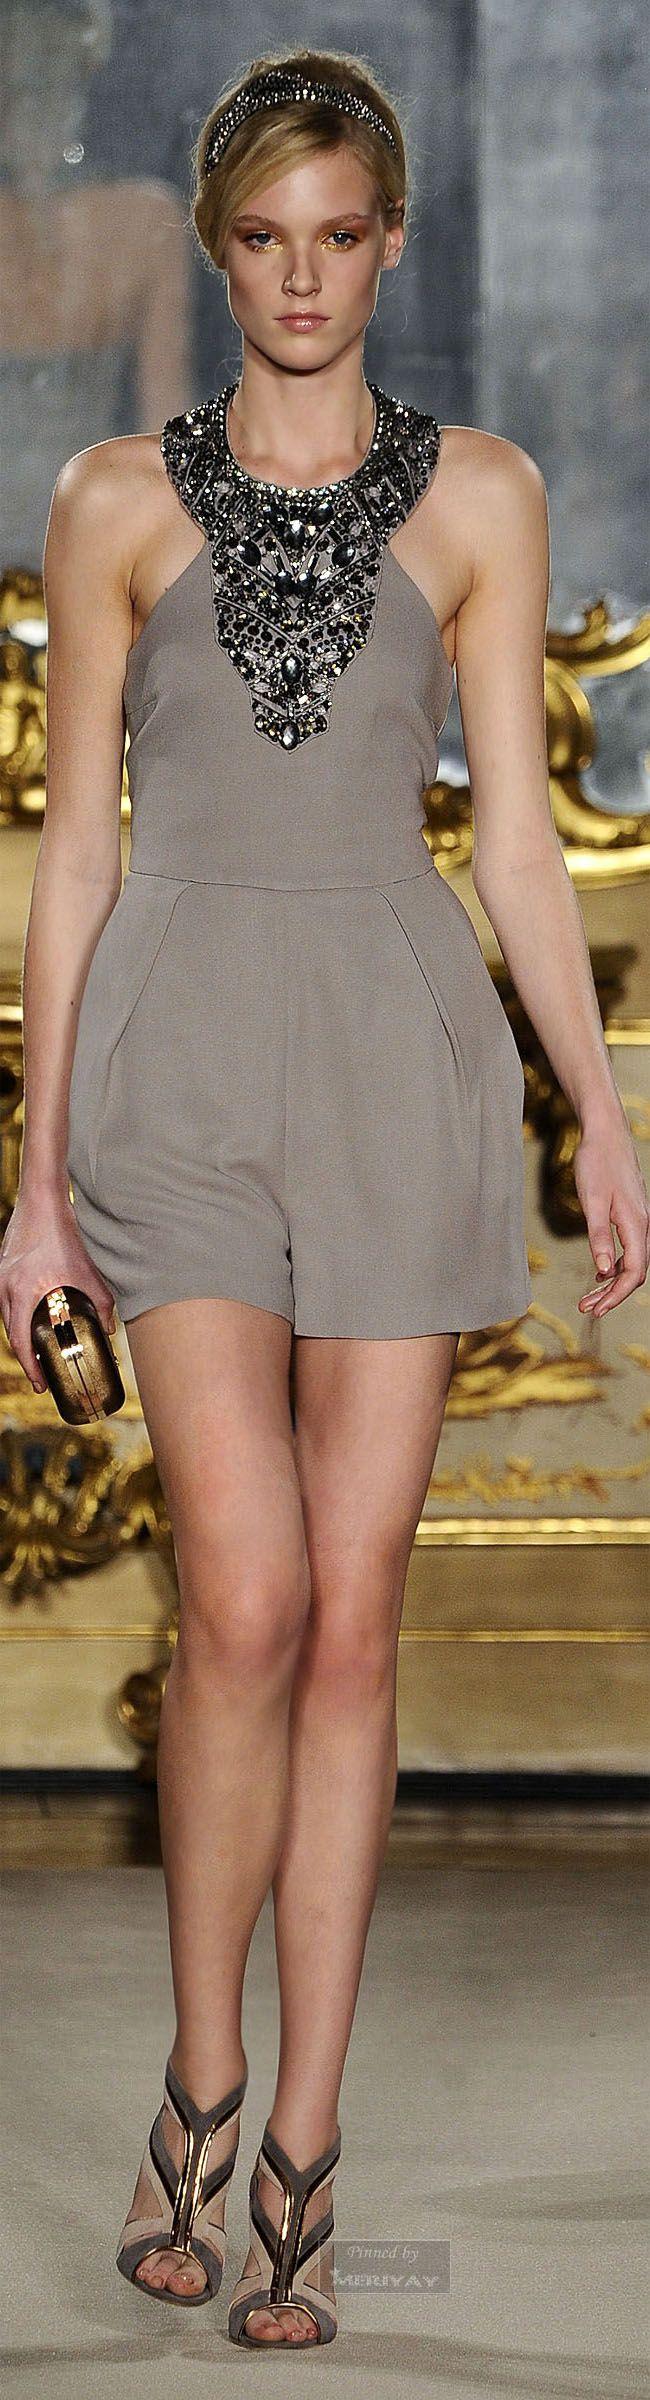 Sparkling, short and extremely elegant - I might consider something similar for Silvester! ☺ -Elisabetta Franchi Spring 2015-